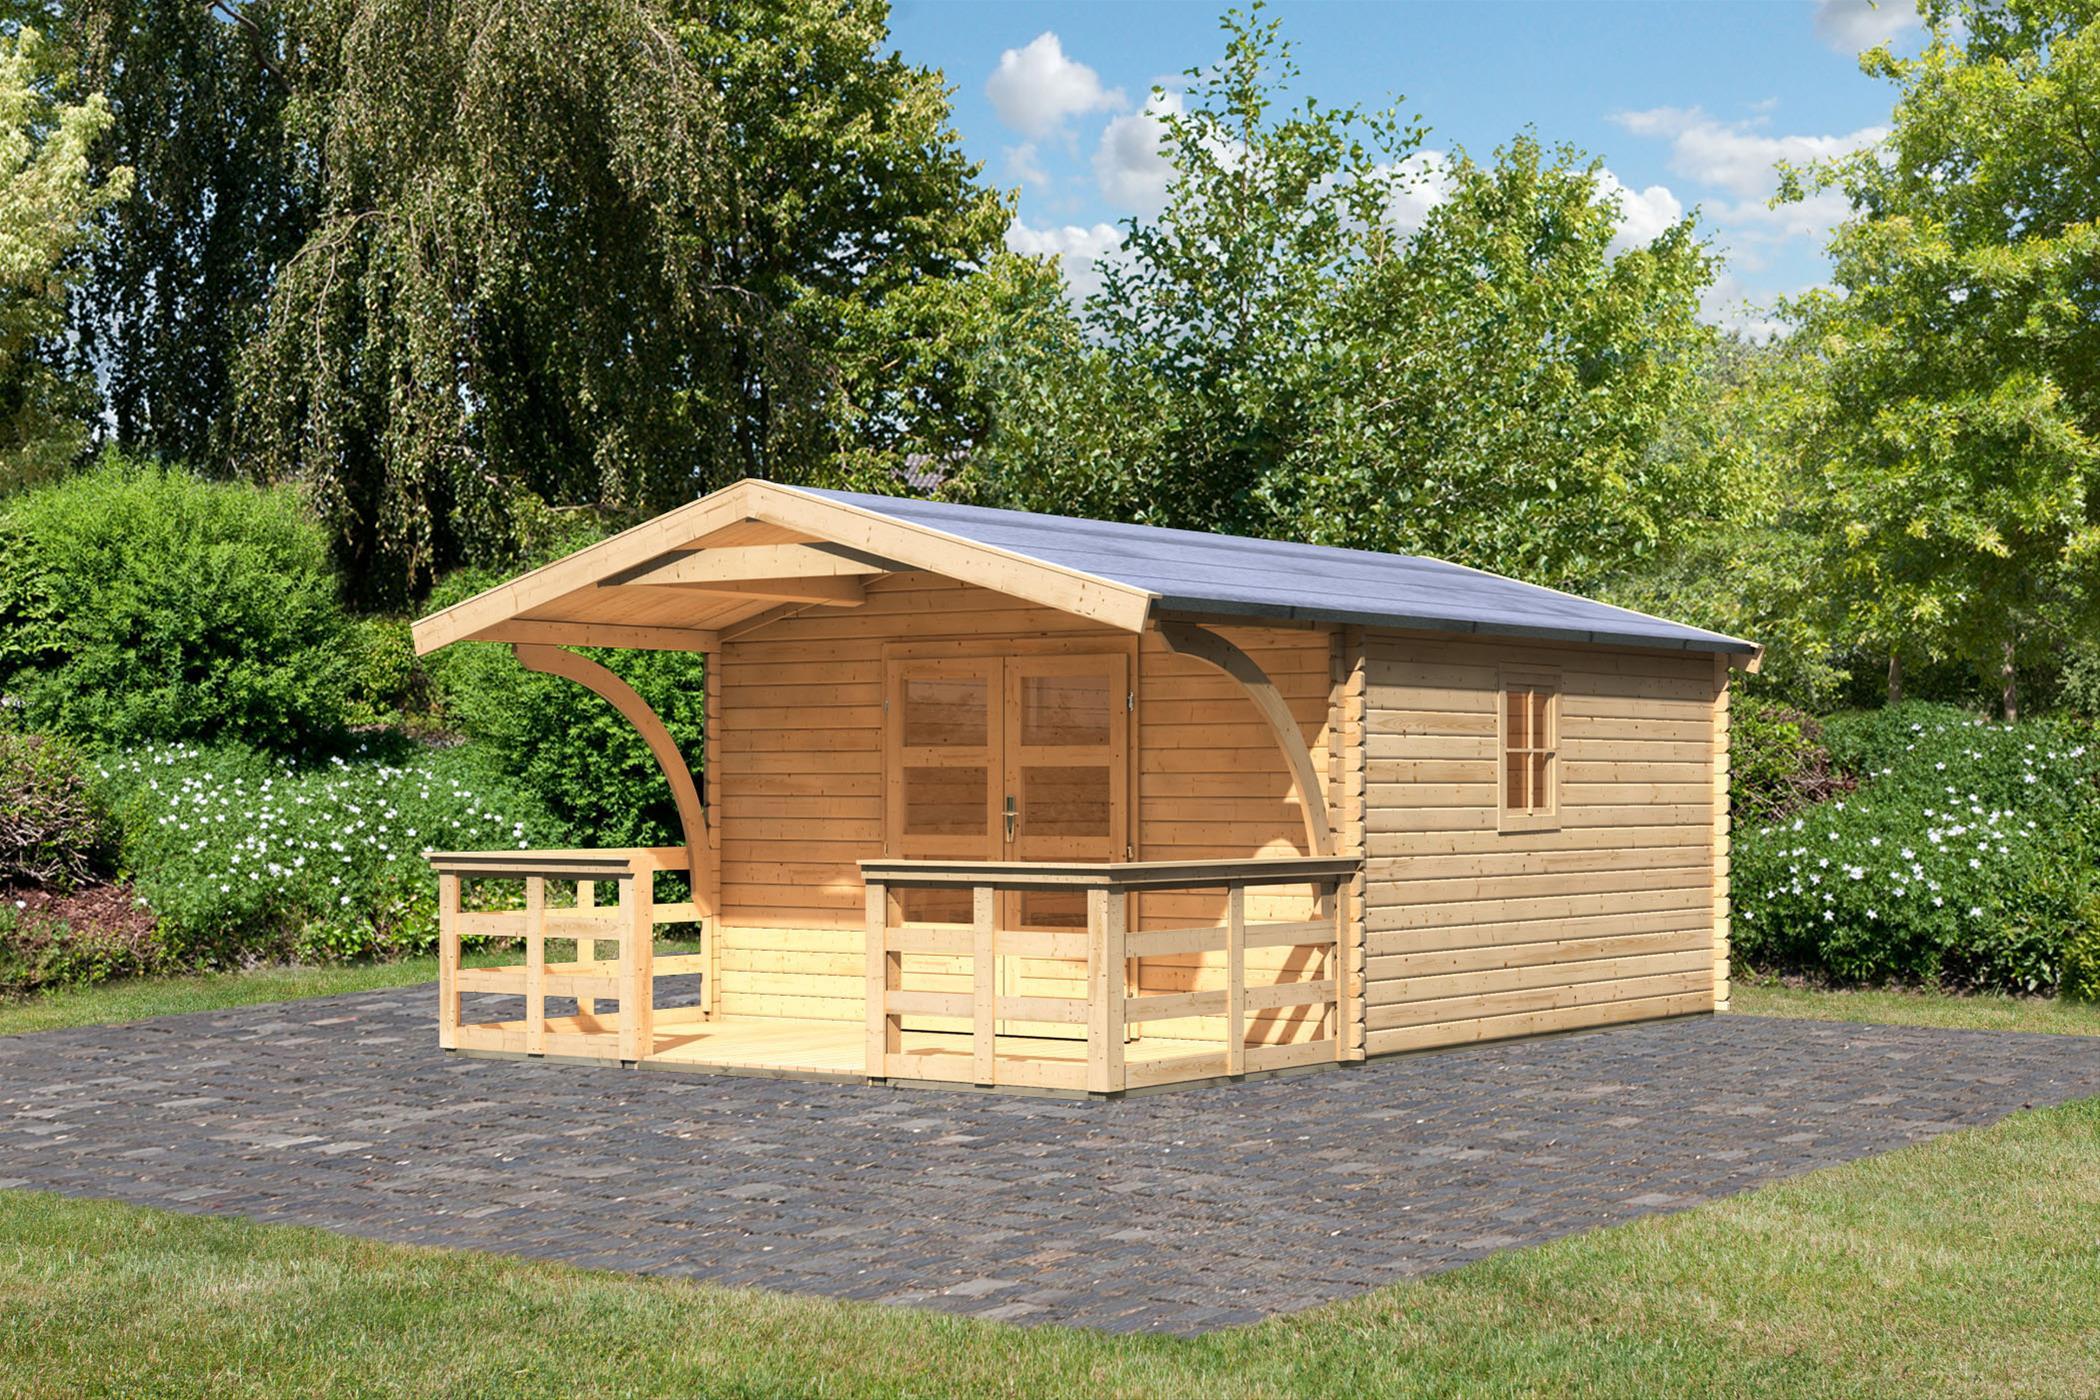 Woodfeeling Gartenhaus 38 mm Meldorf 6 VD+Terrasse natur 404x590cm Bild 2